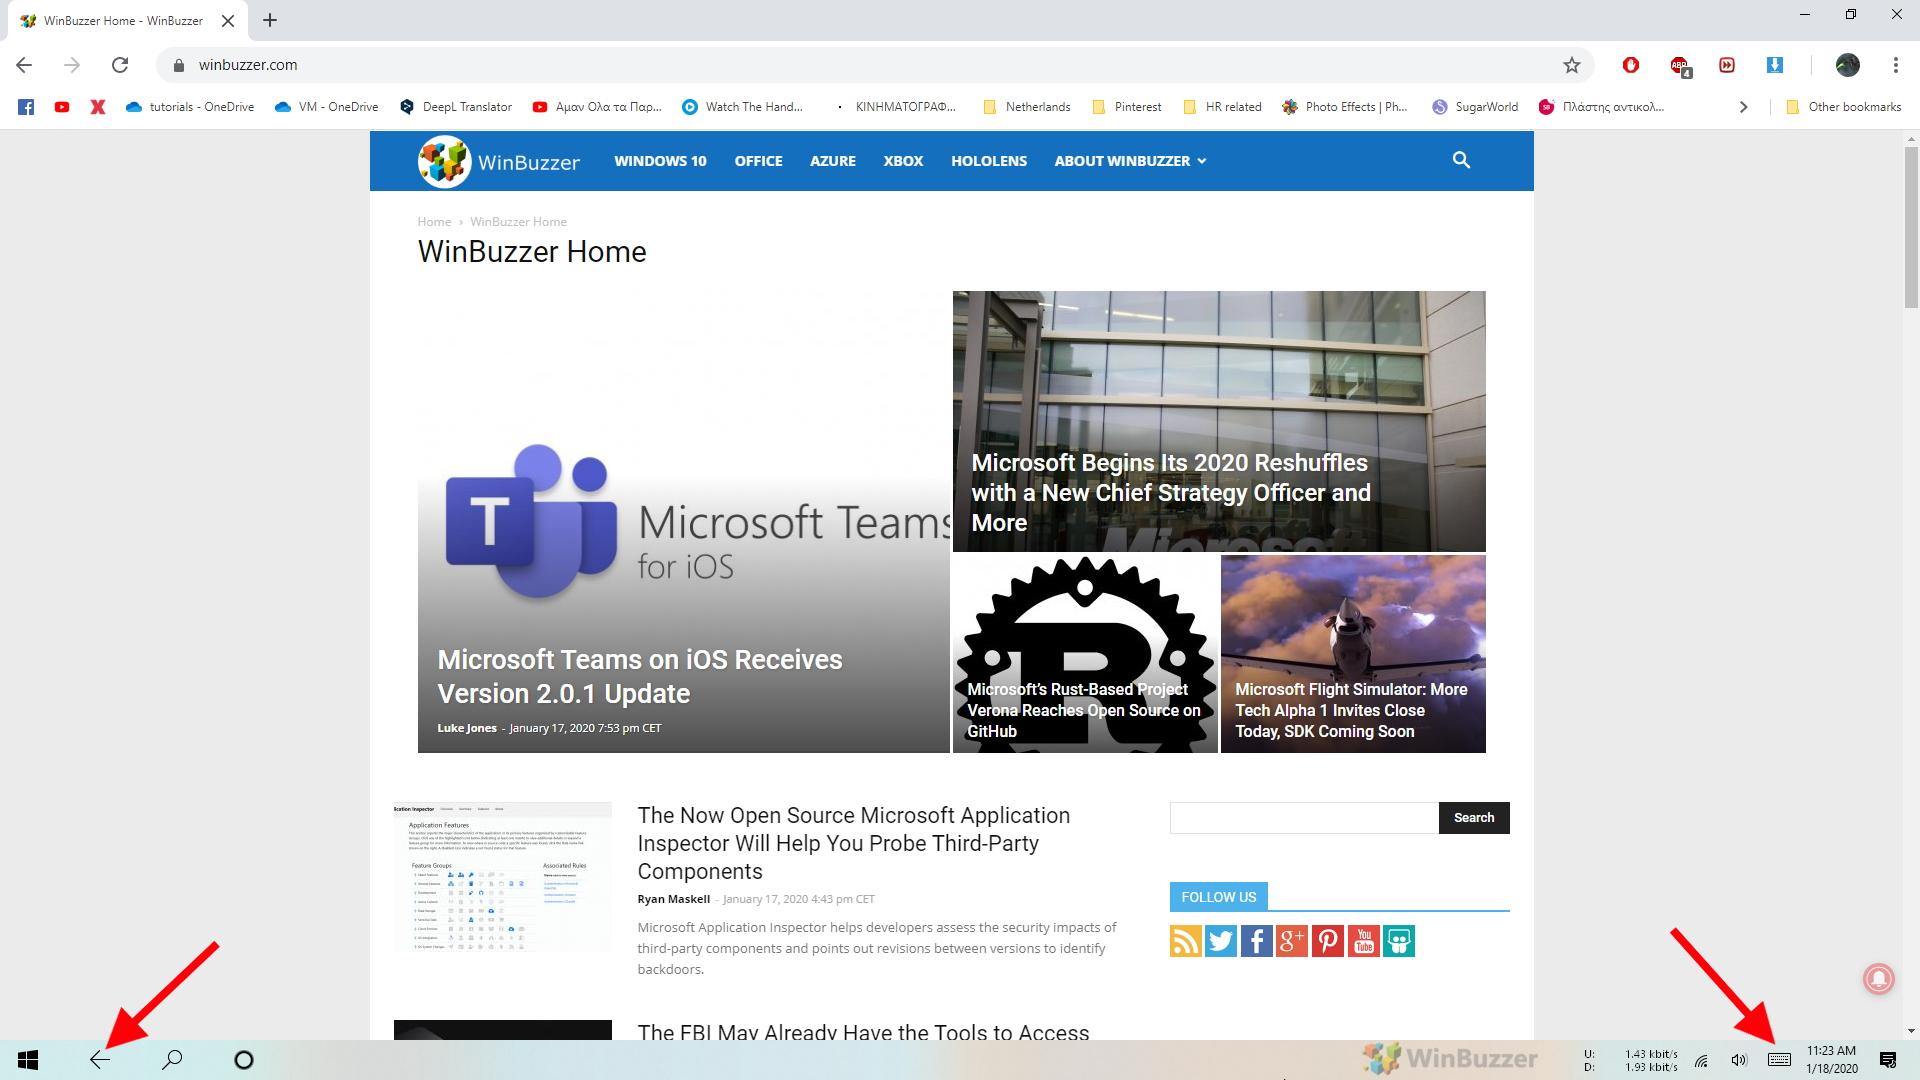 Windows 10 - Tablet Mode - Taskbar